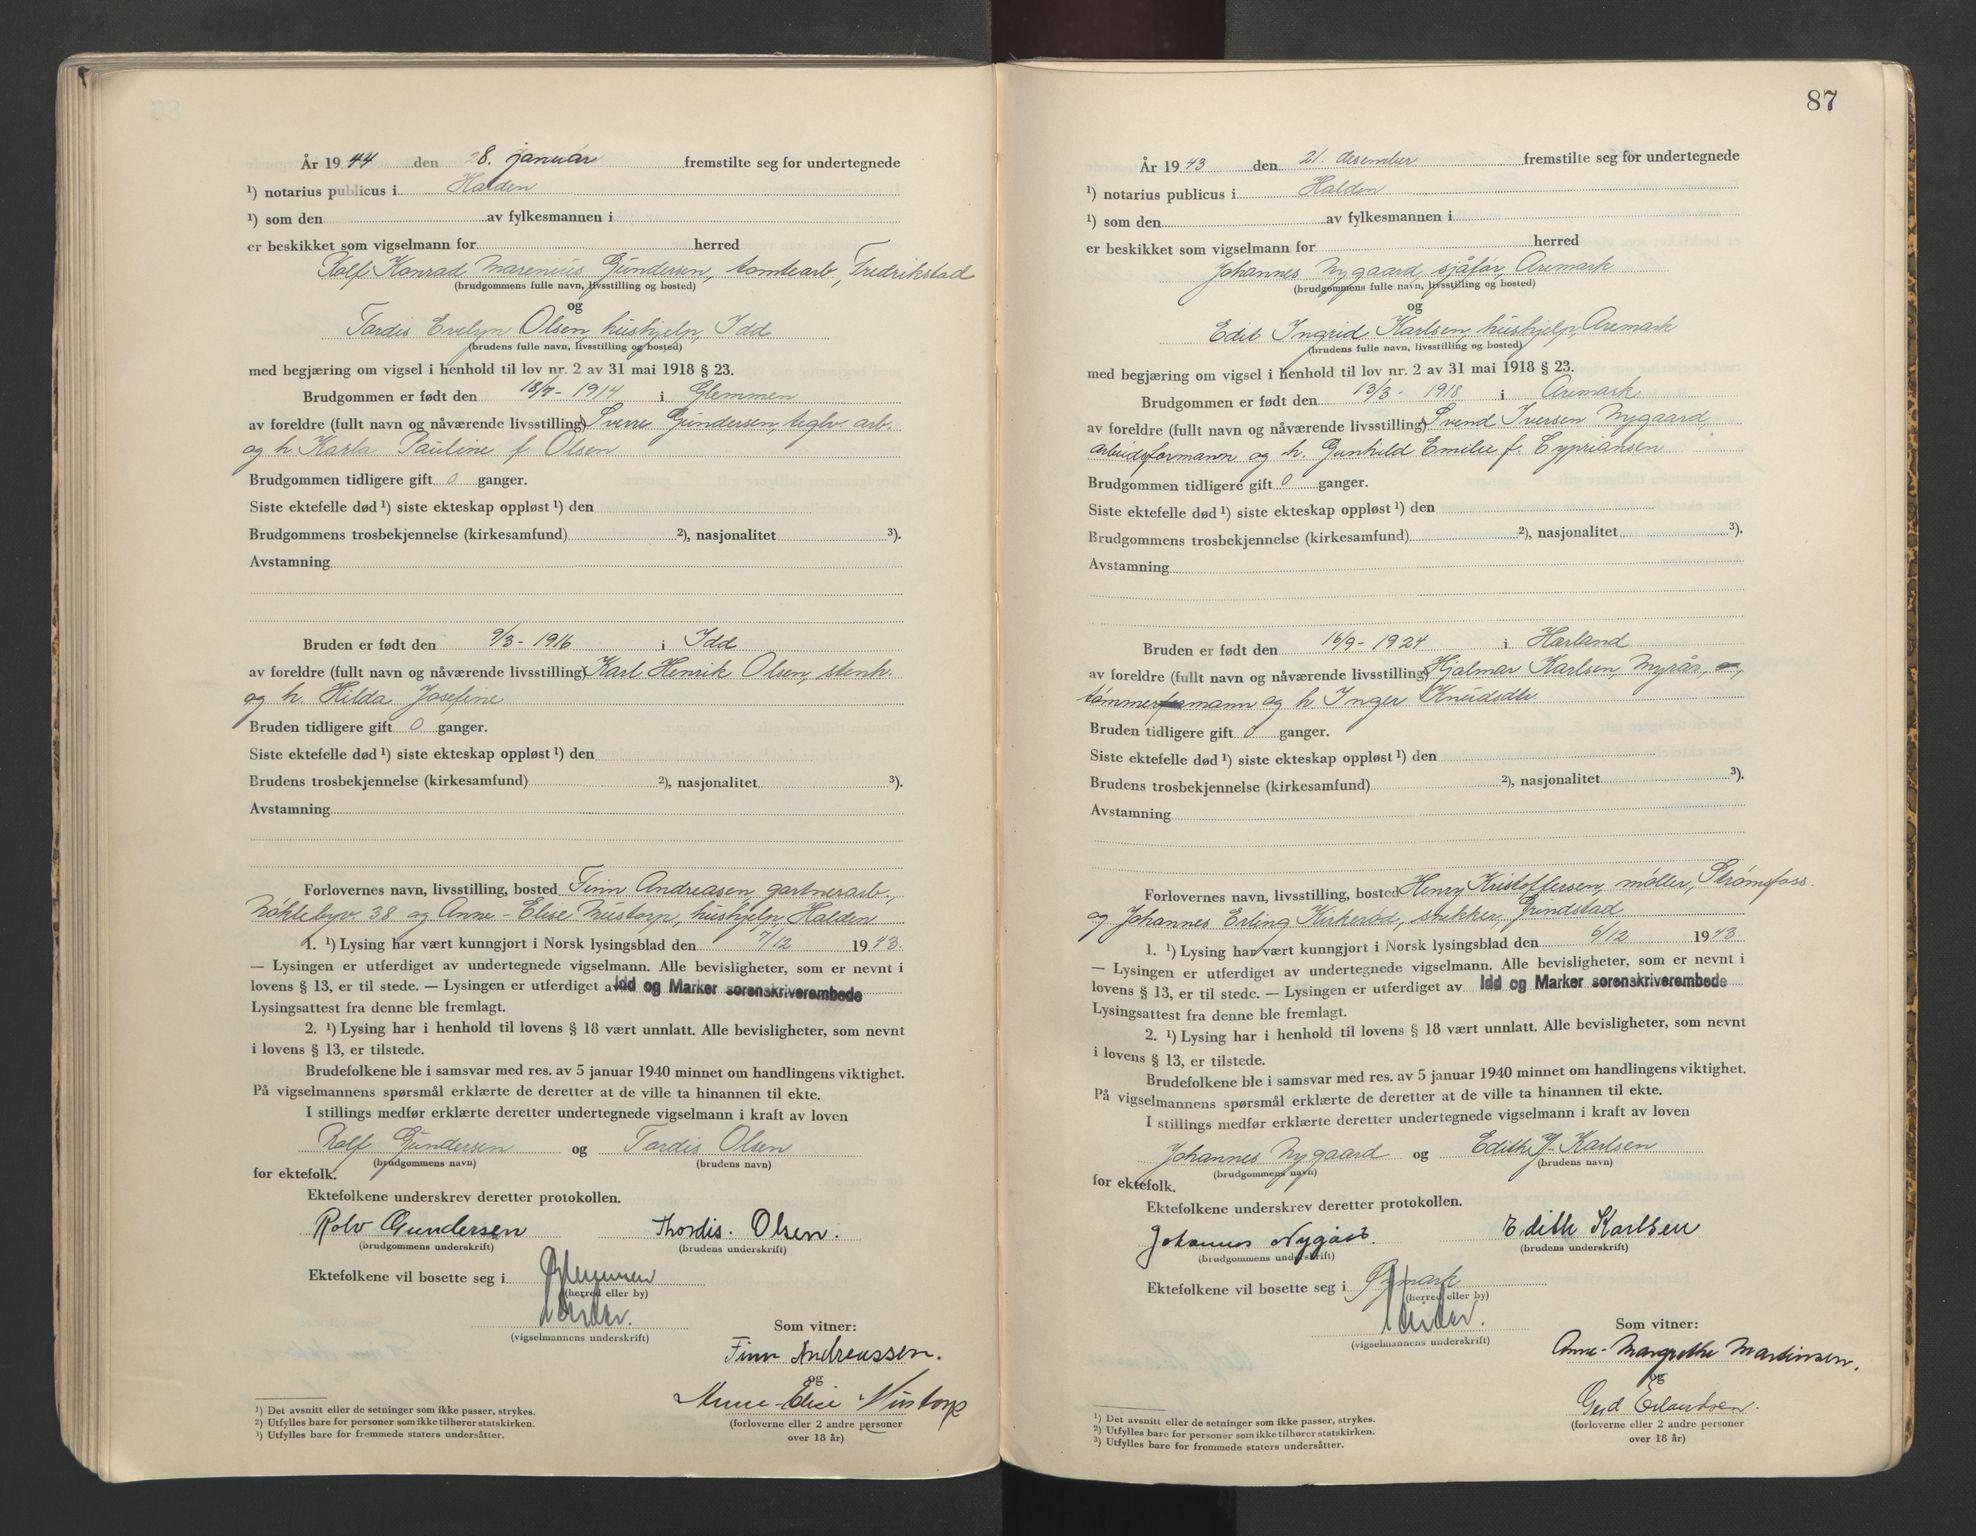 SAO, Idd og Marker sorenskriveri, L/Lc/L0001: Vigselsbøker, 1942-1944, s. 87